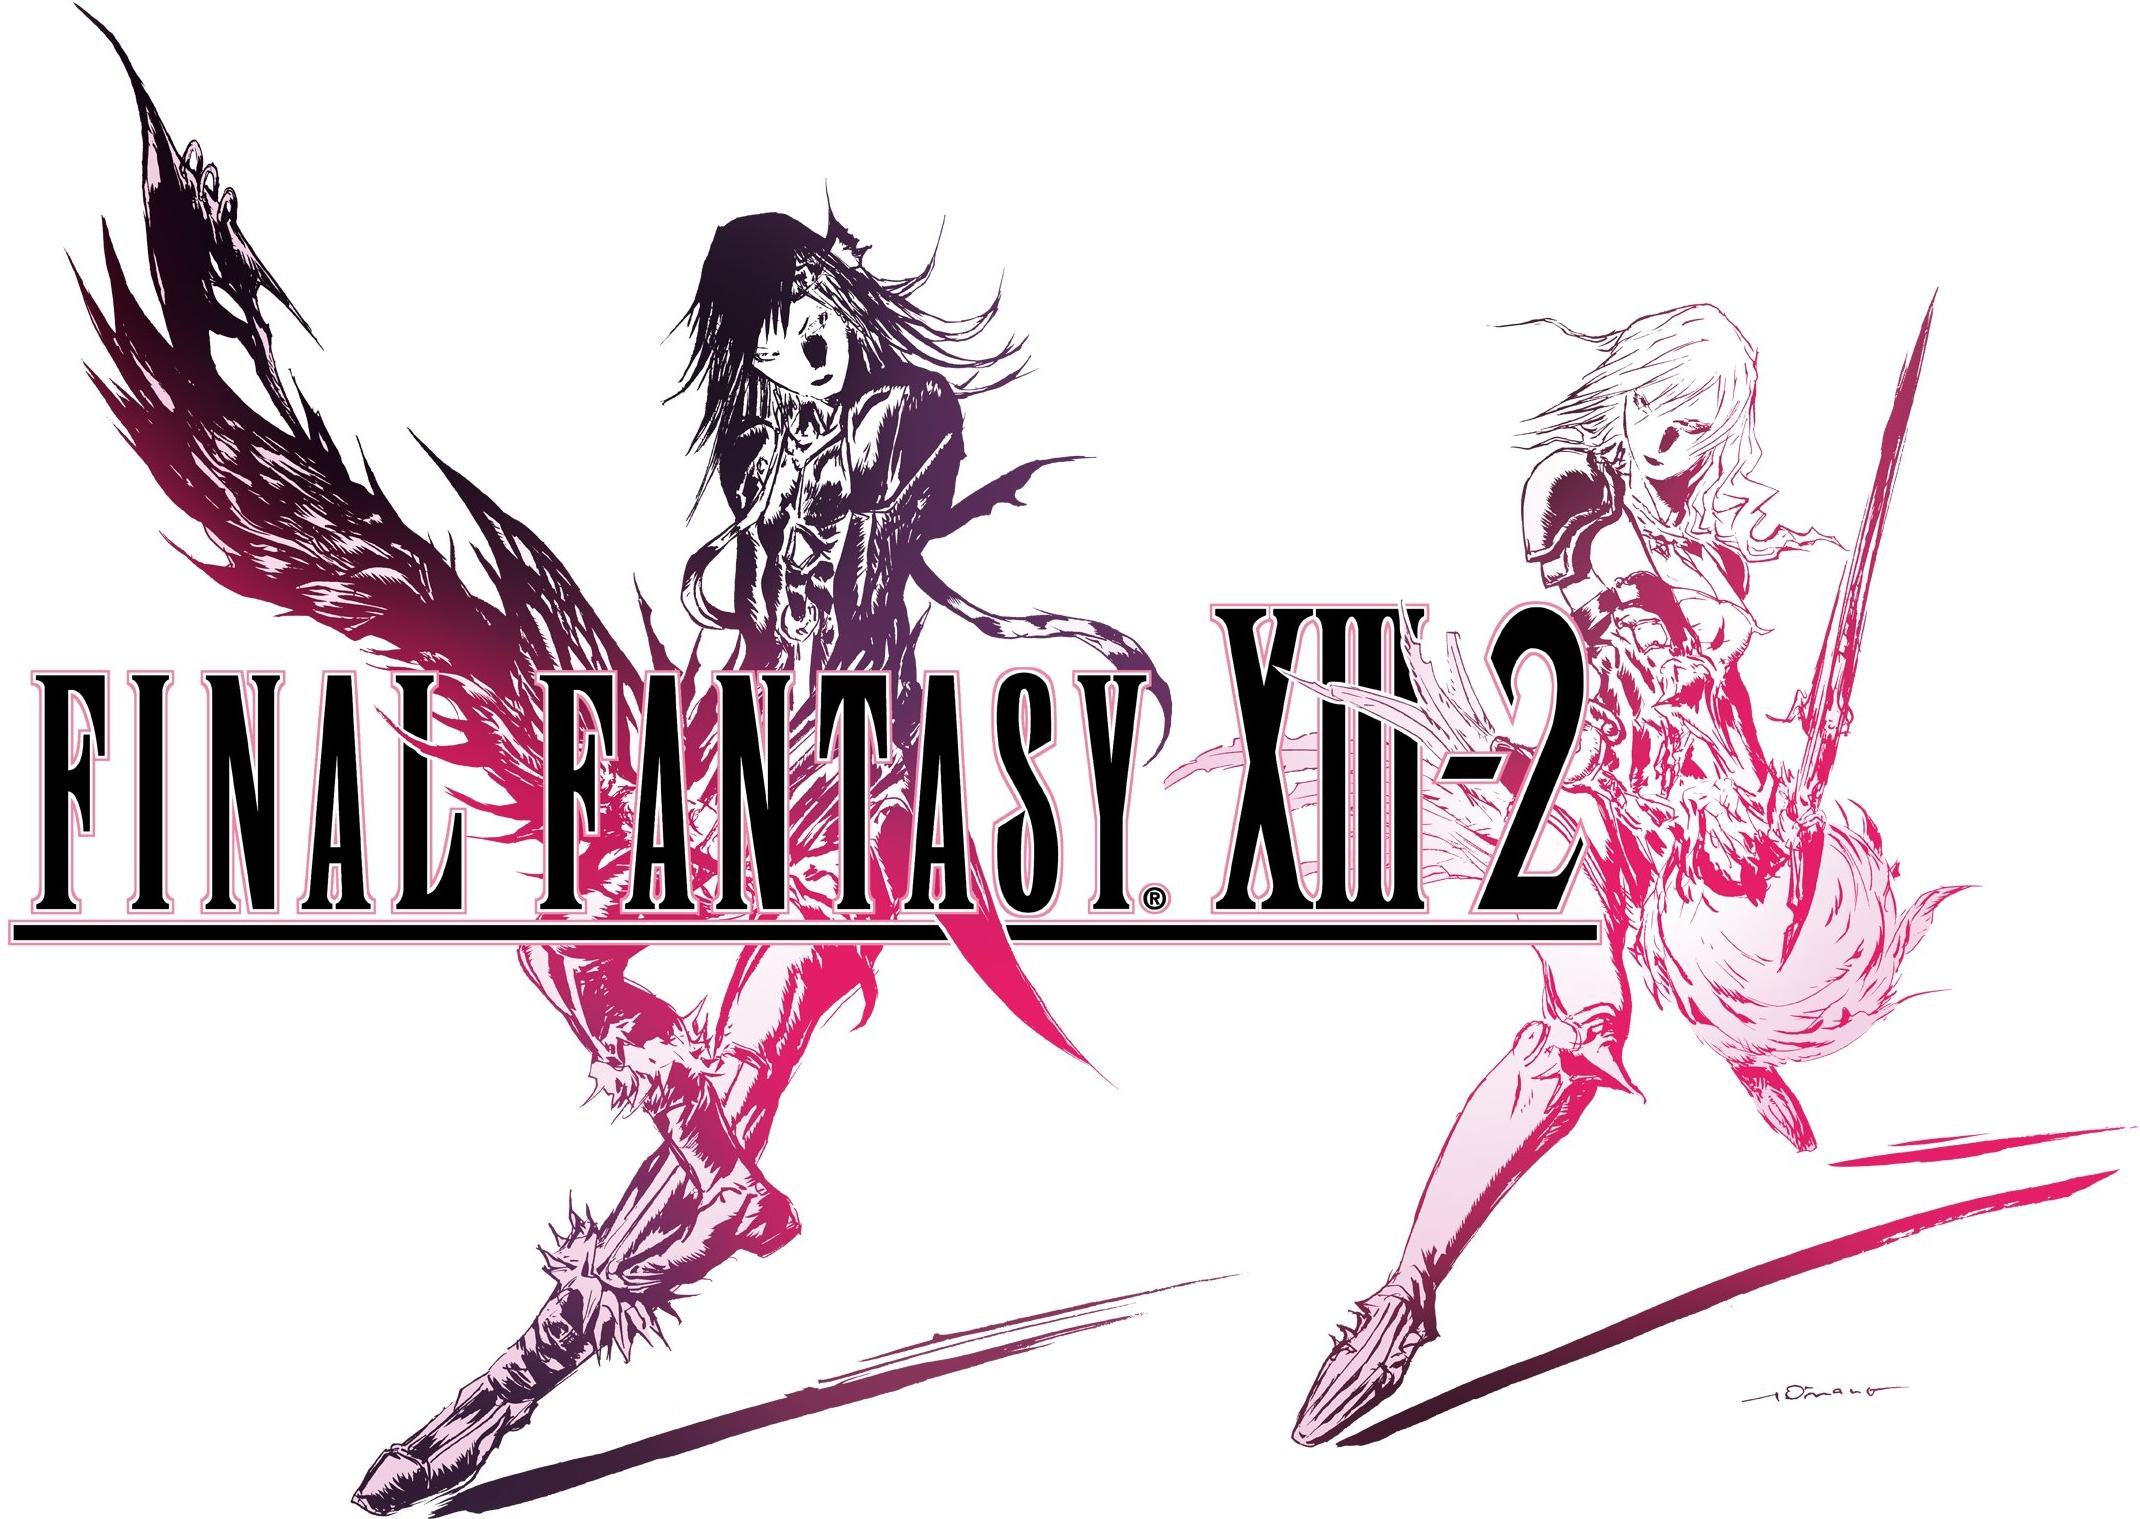 FinalFantasy XIII-2 LogoXiii Logo